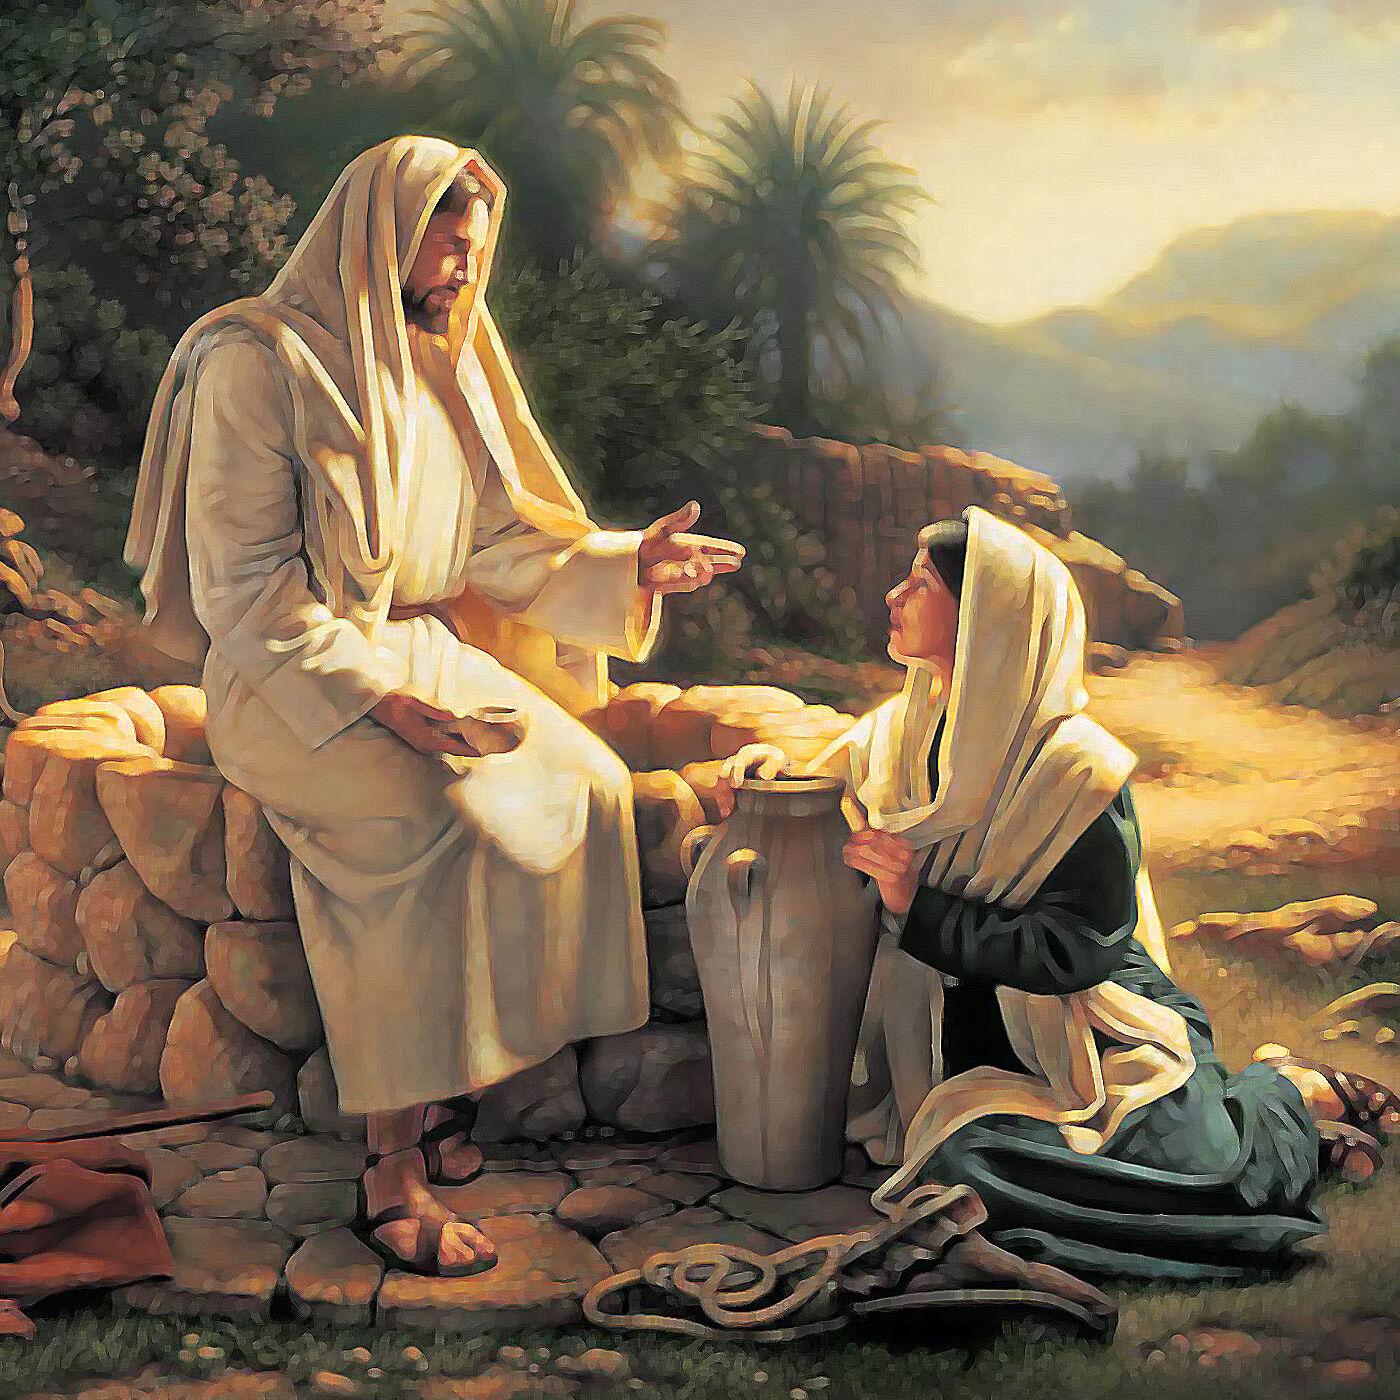 riflessioni sul Vangelo di Venerdì 15 Ottobre 2021 (Lc 12, 1-7)